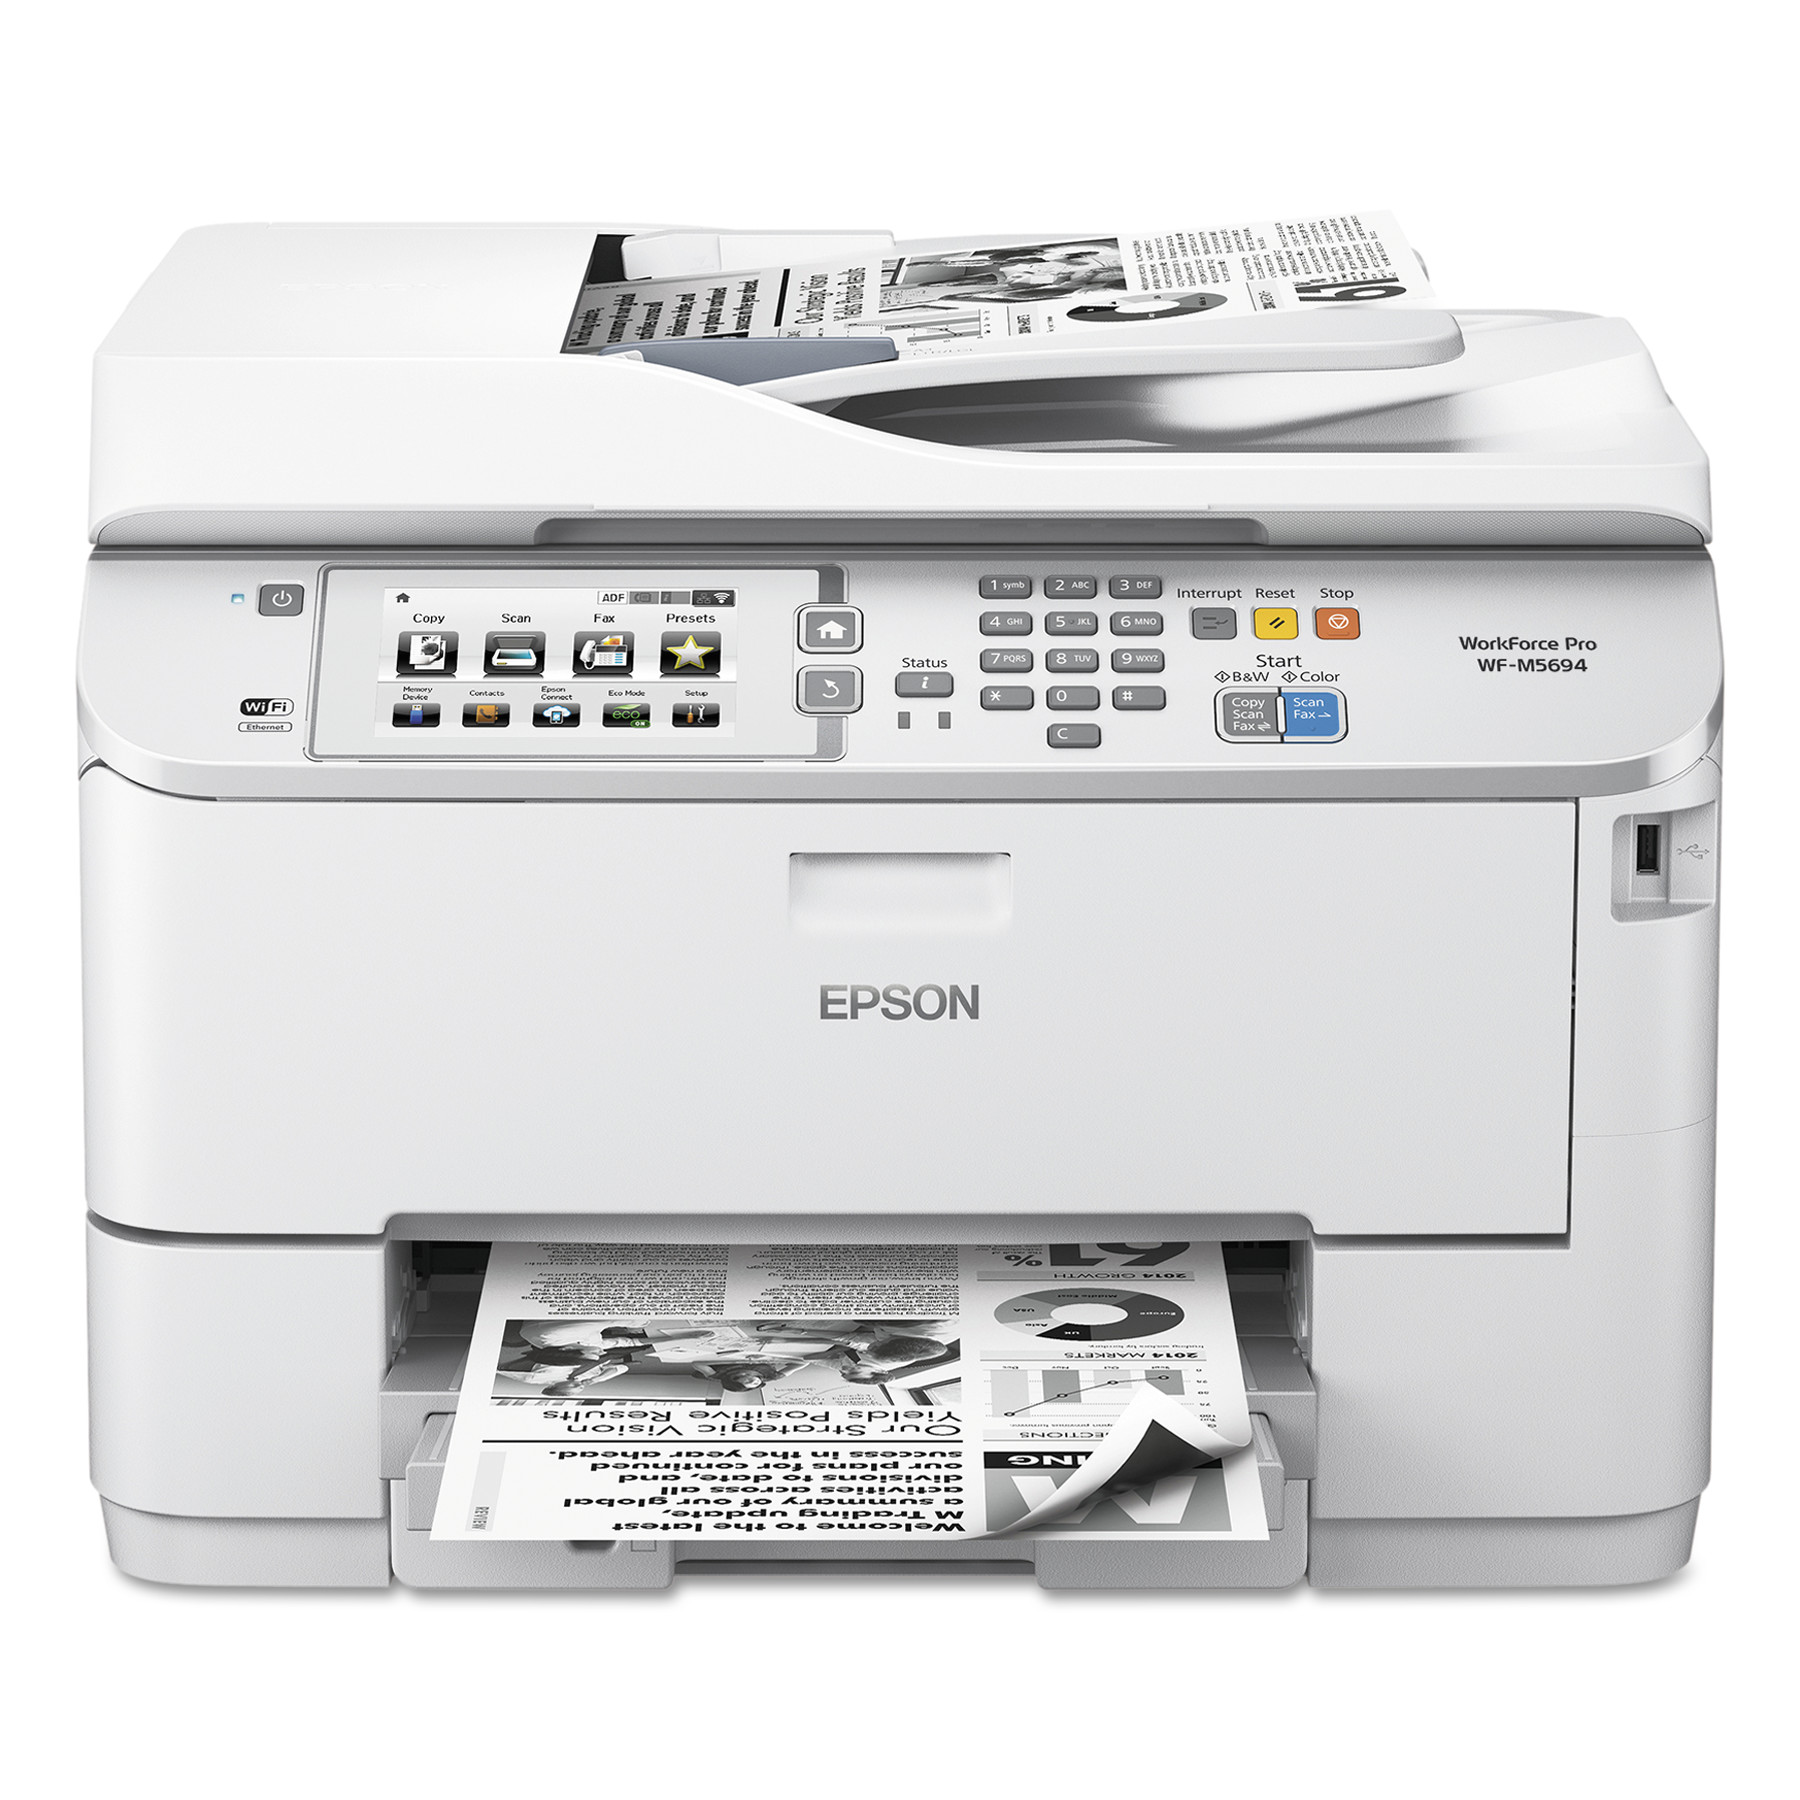 Epson WorkForce Pro M5694 Printer by Epson